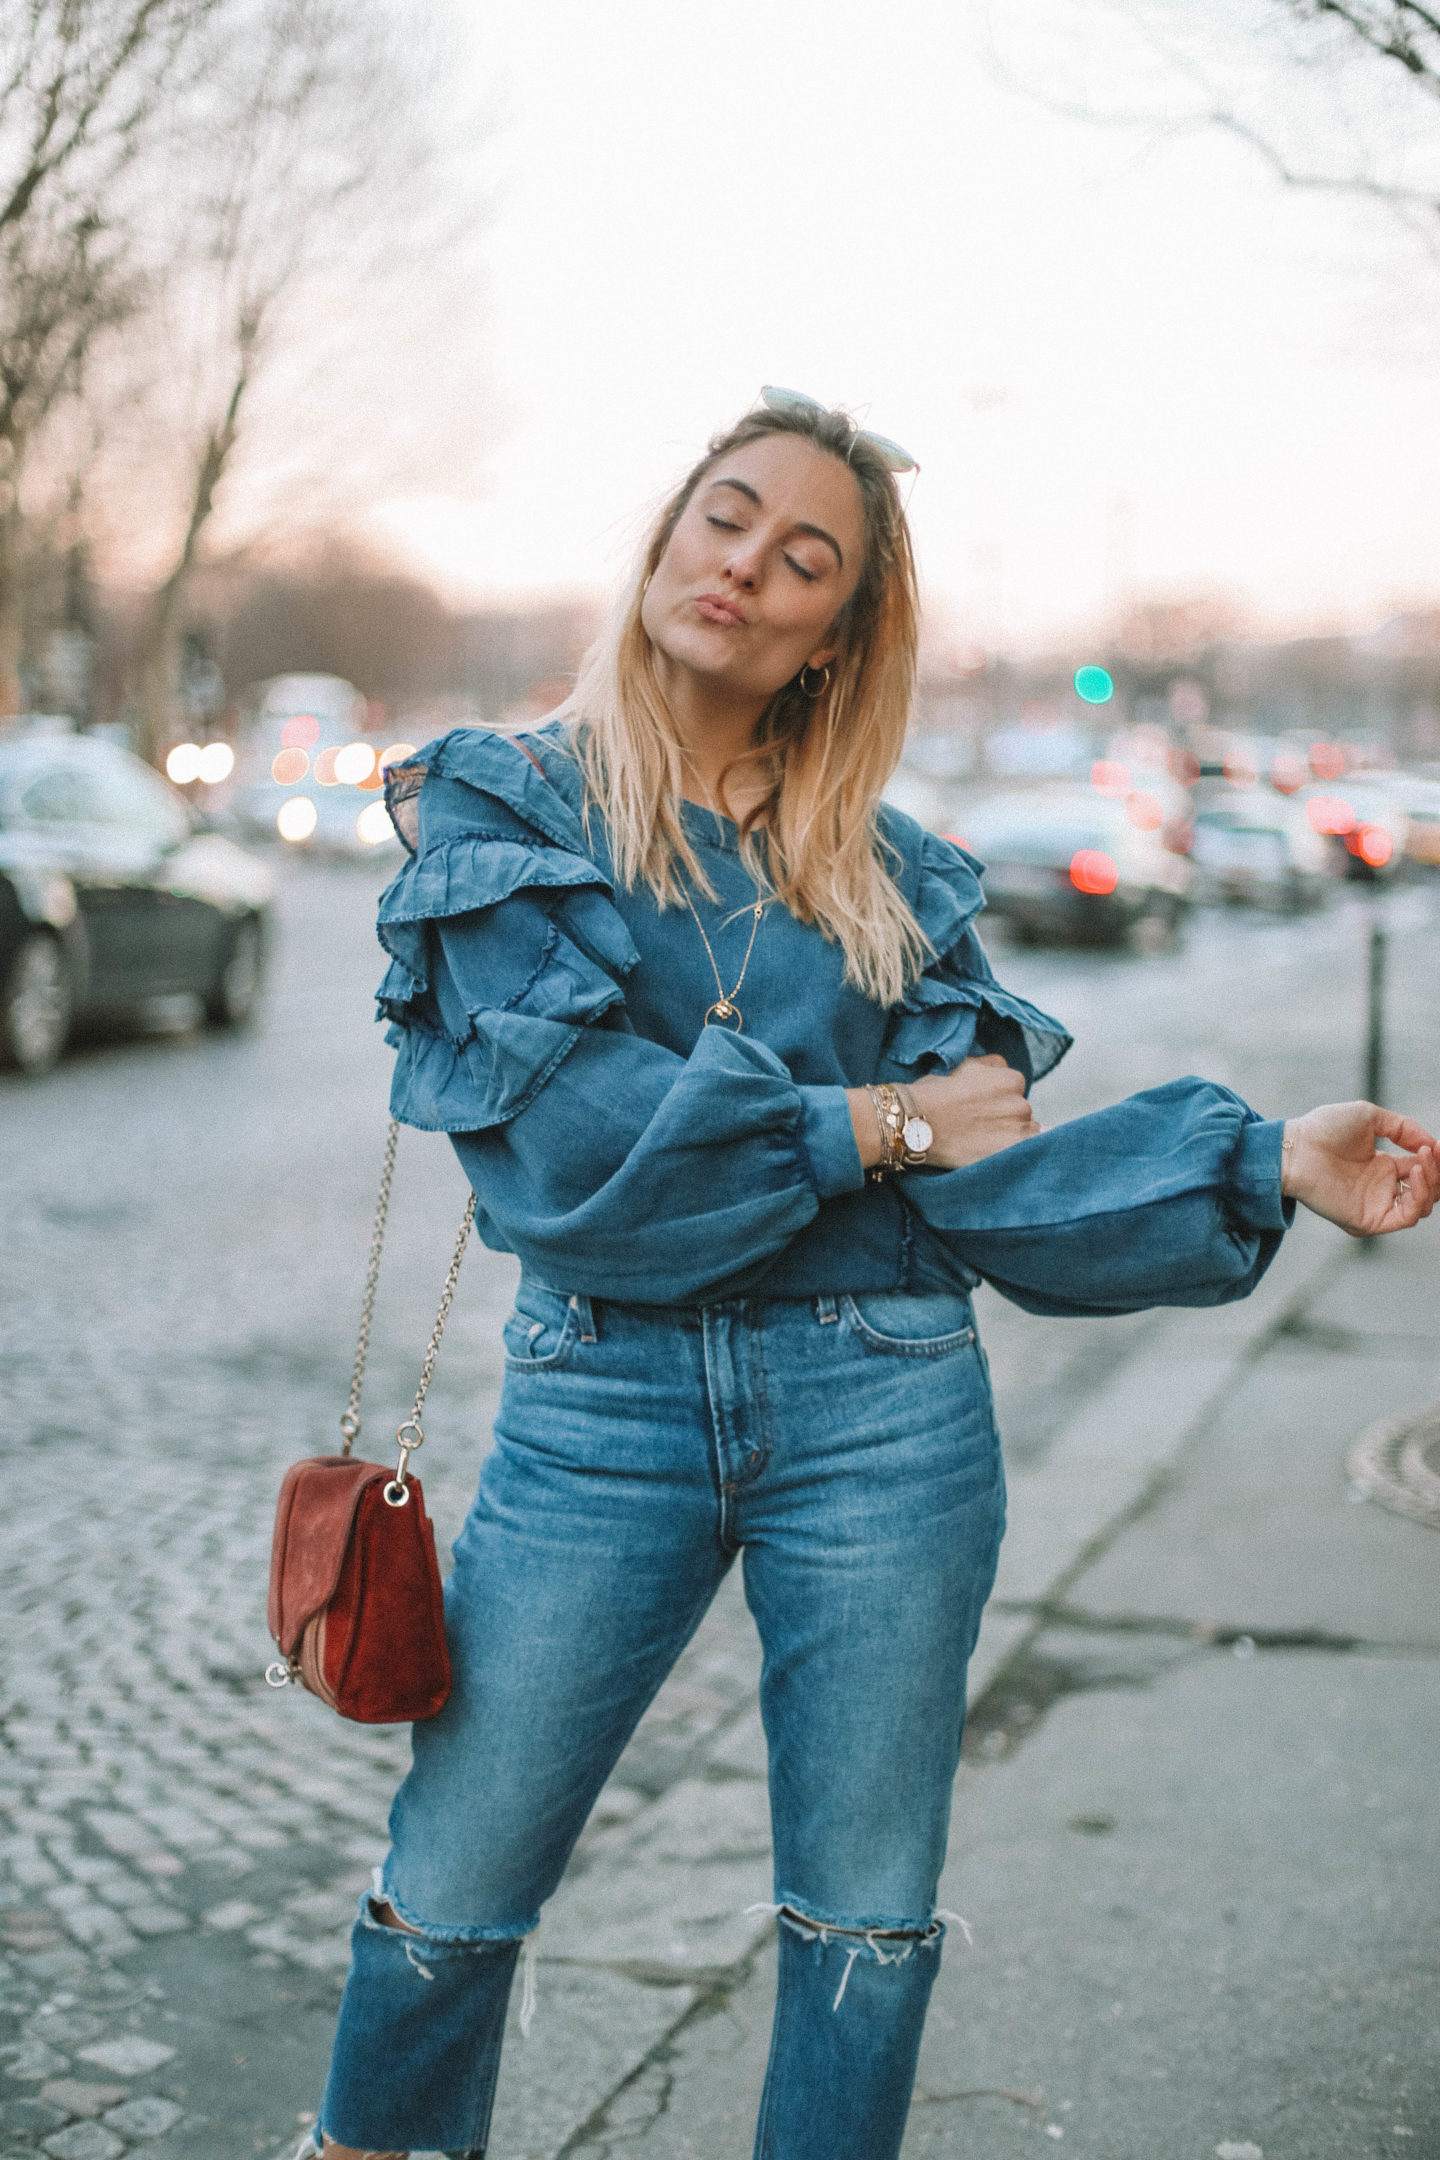 Sac Tiger Sézanne - Blondie Baby blog mode & voyages